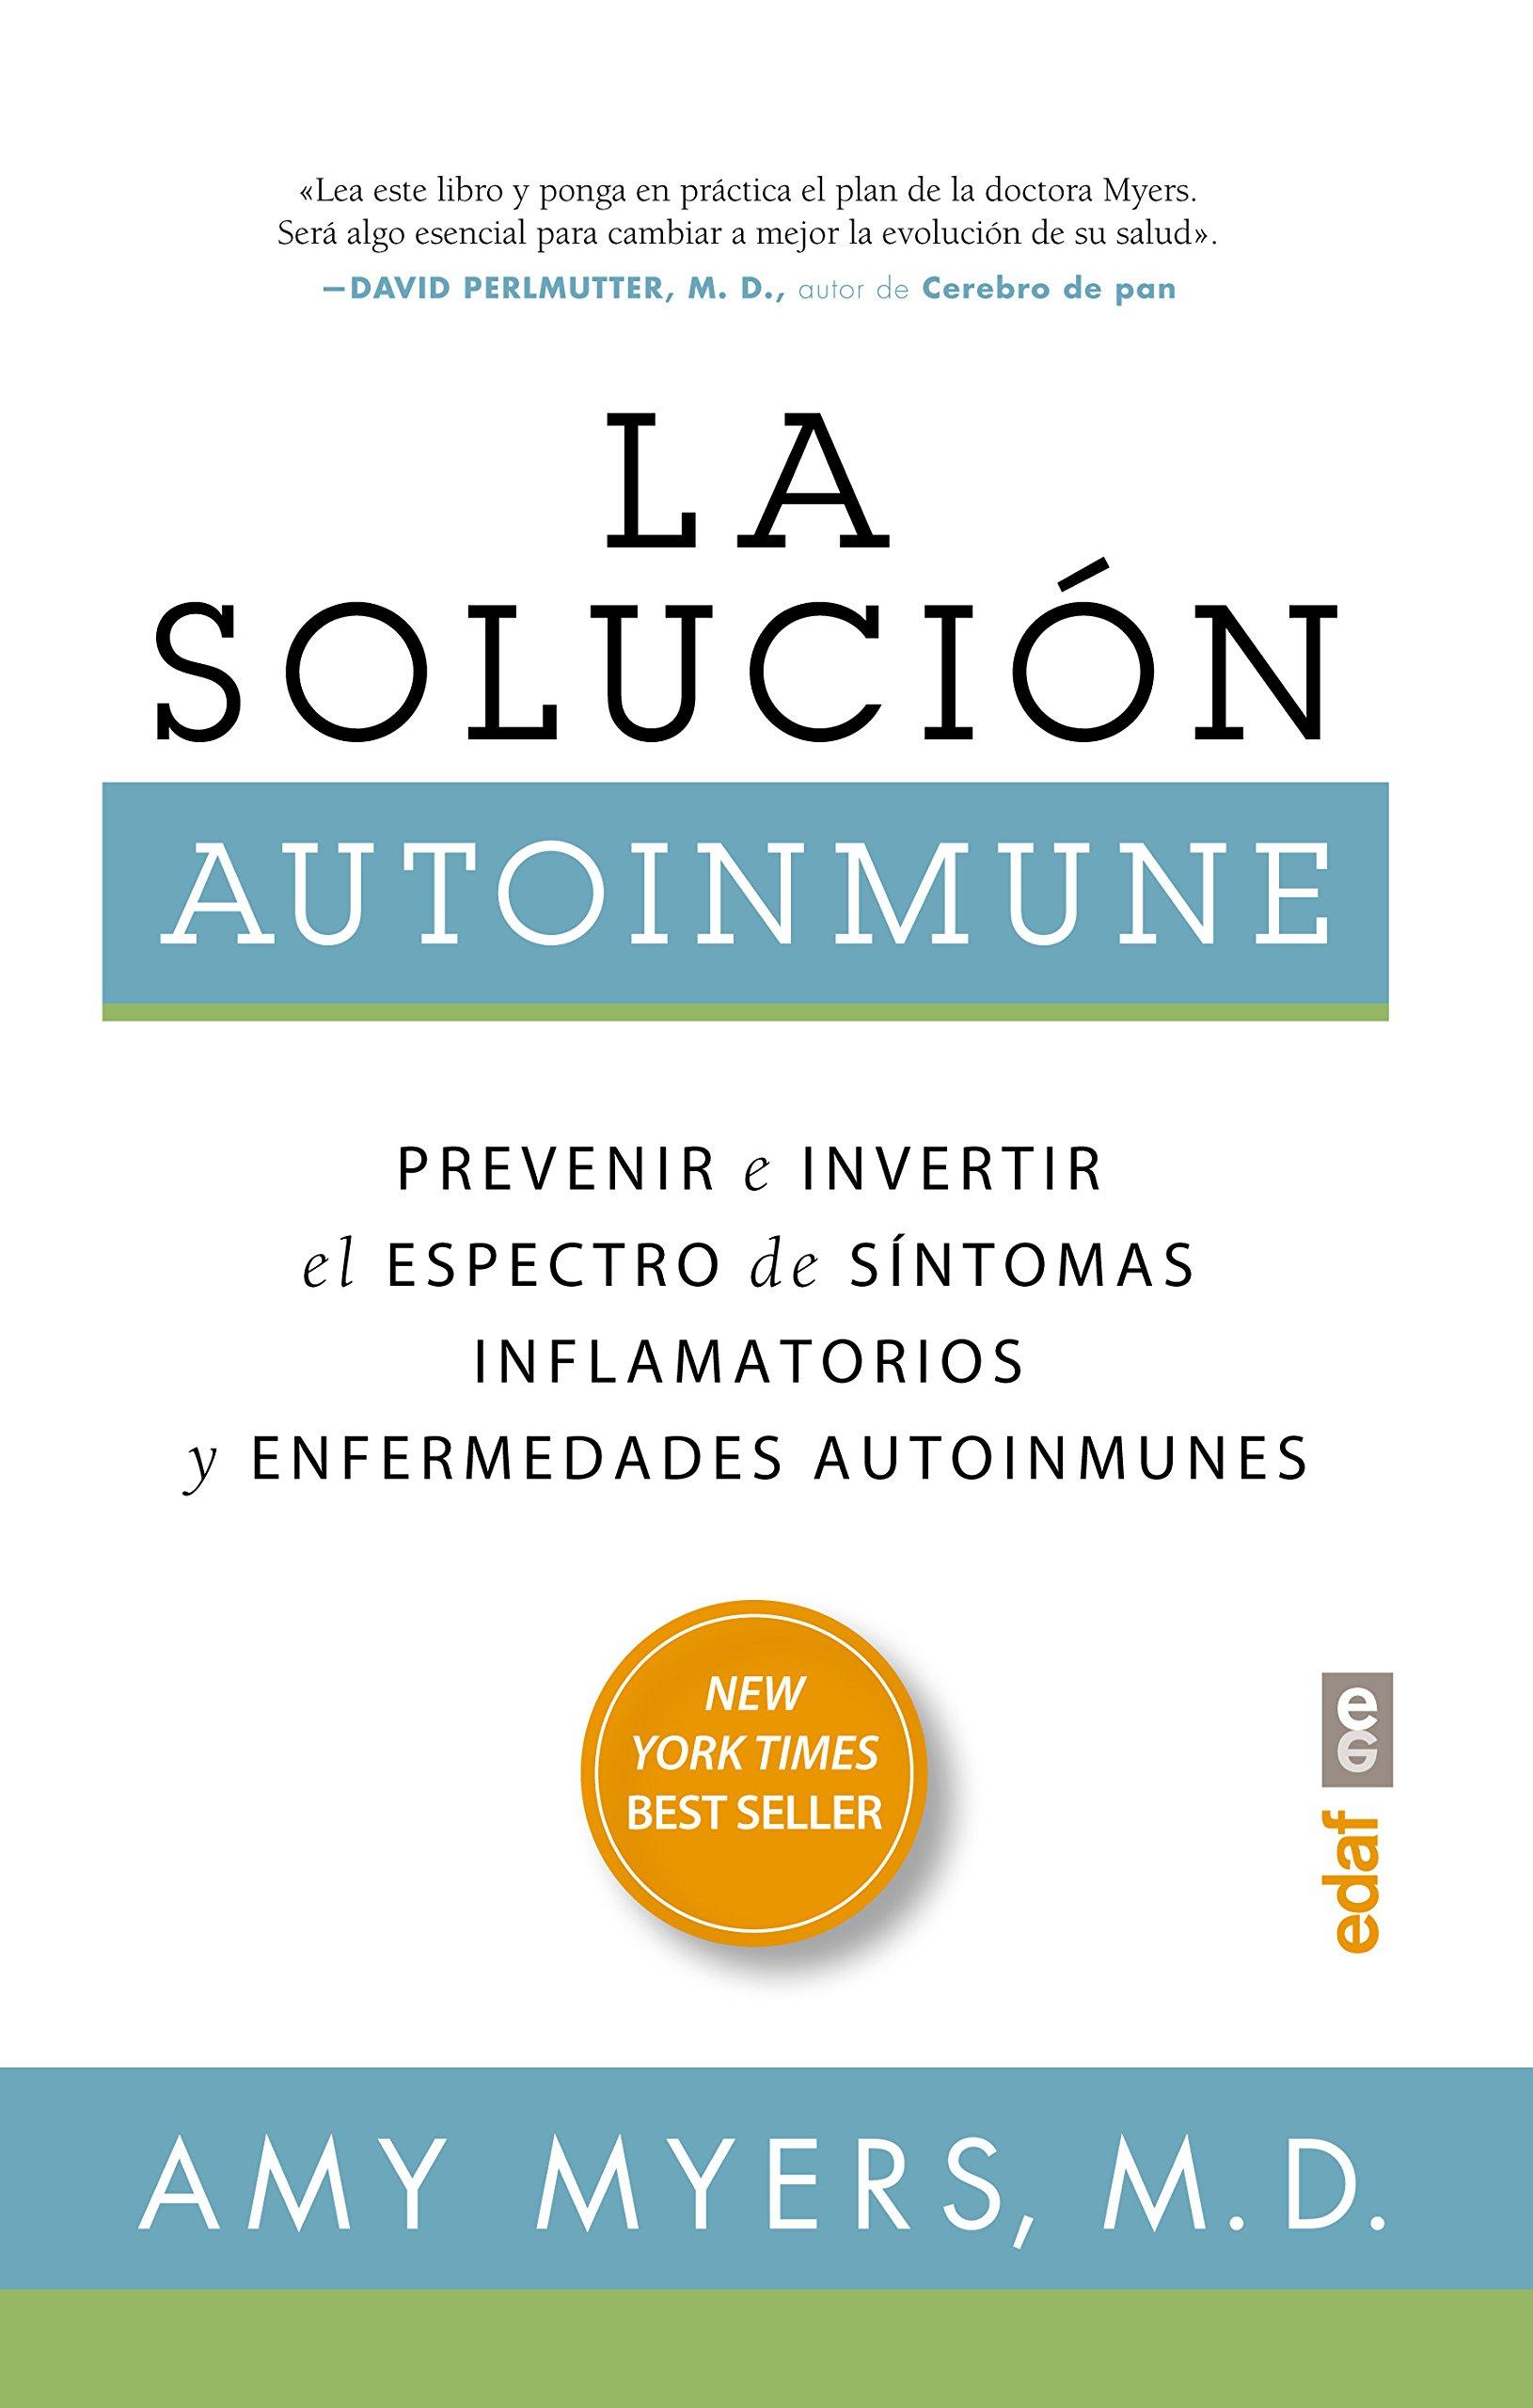 La solucion autoinmune (Spanish Edition) pdf epub